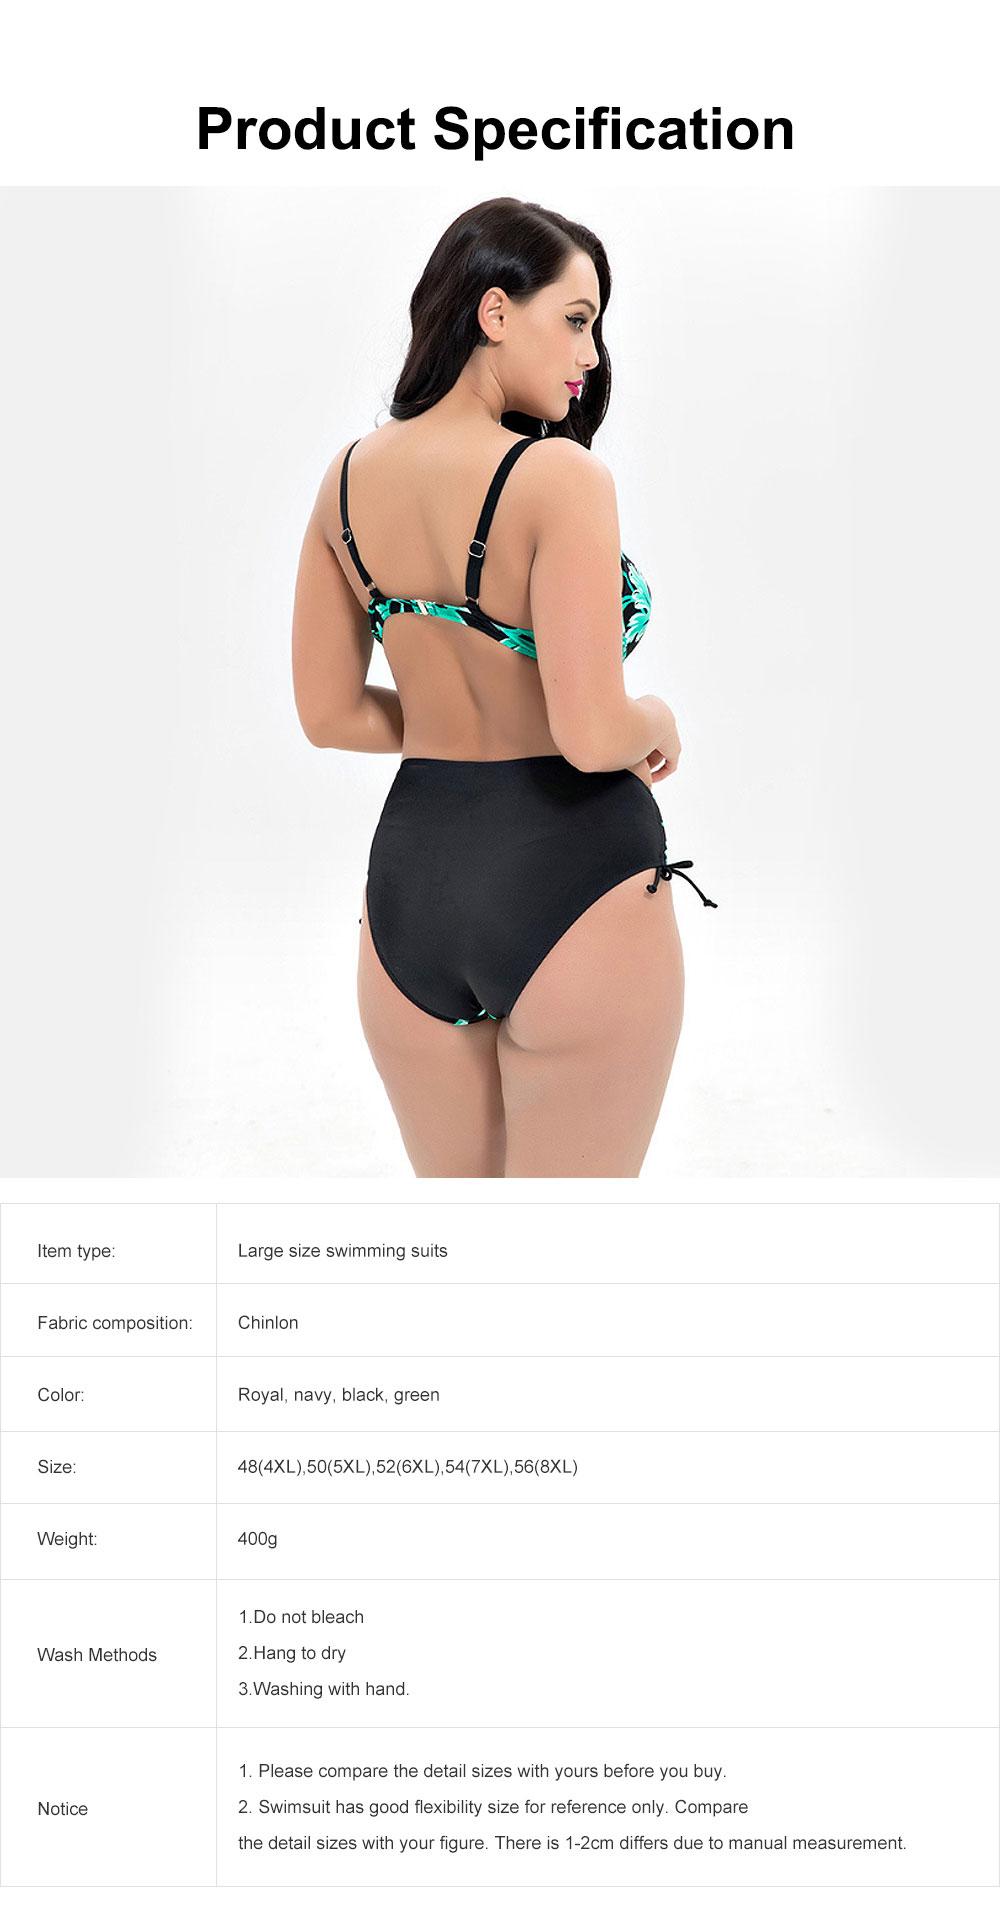 Women's Large Size Sexy Swimming Suits, Two-Piece Plus Size Beachwear, Fashion Printing Bathing Suits 4XL 5XL 6XL 7XL 8XL 6